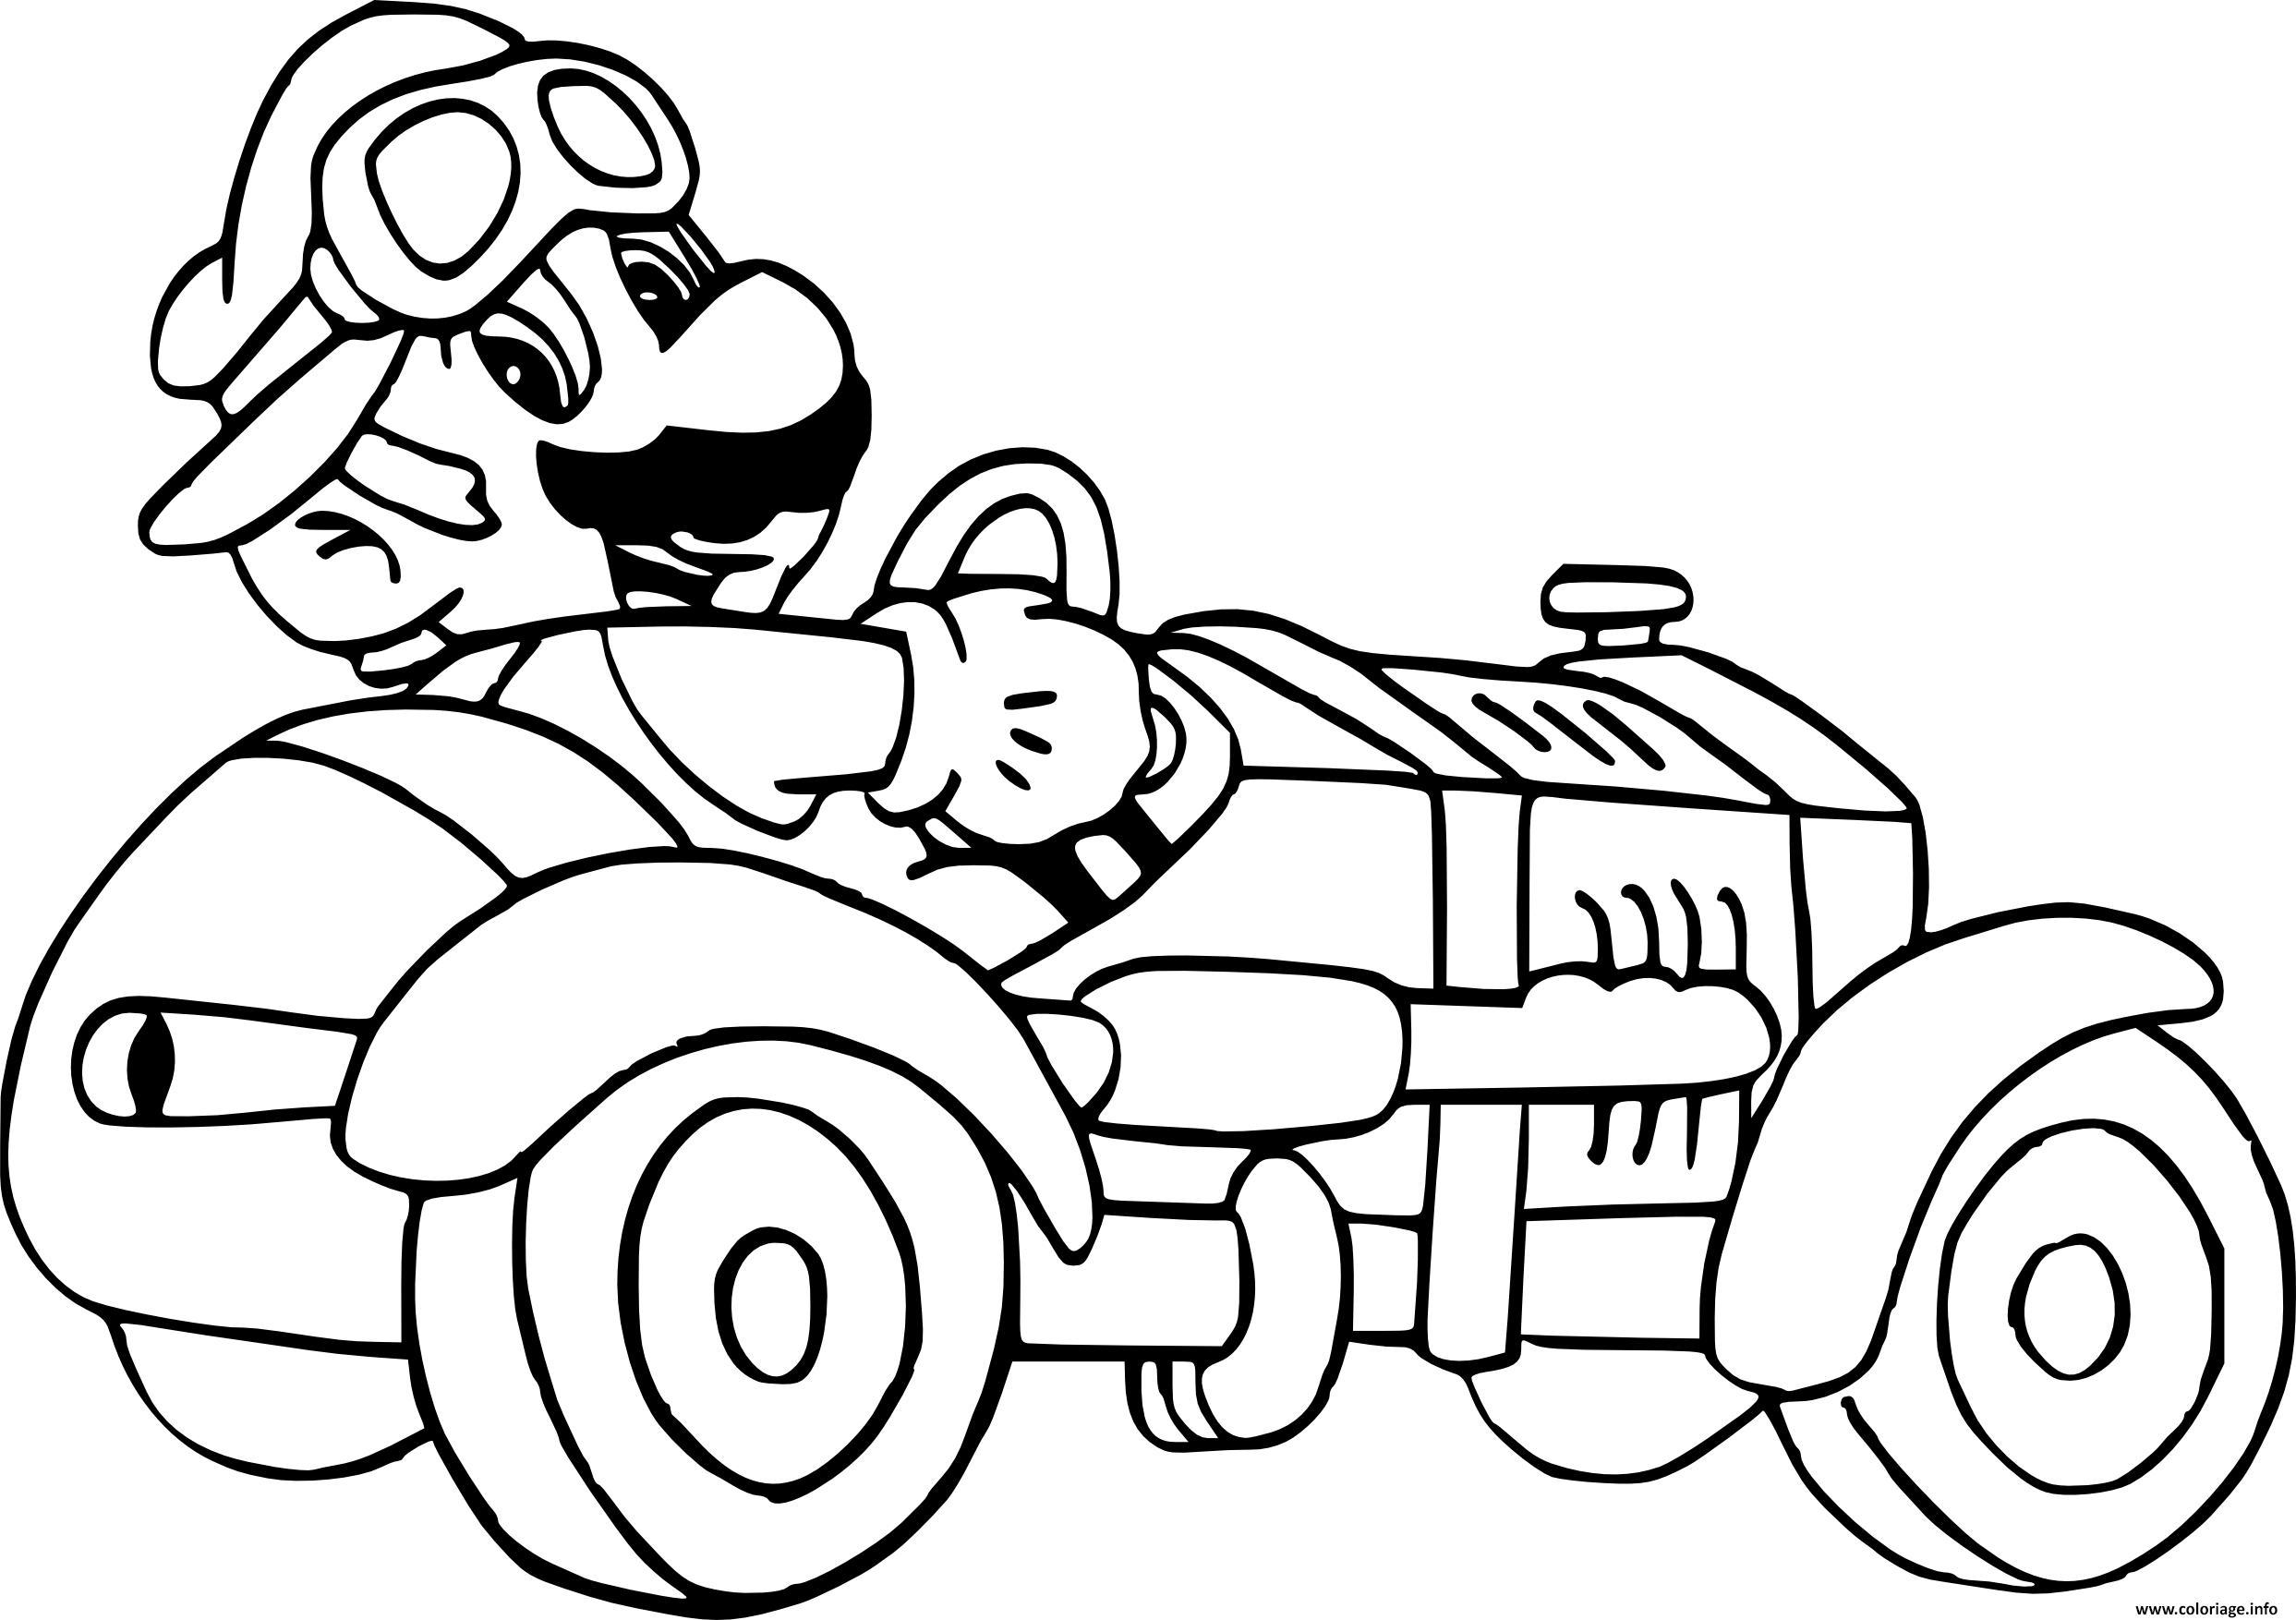 Coloriage mario kart ancienne voiture dessin - Dessin de voiture ancienne ...